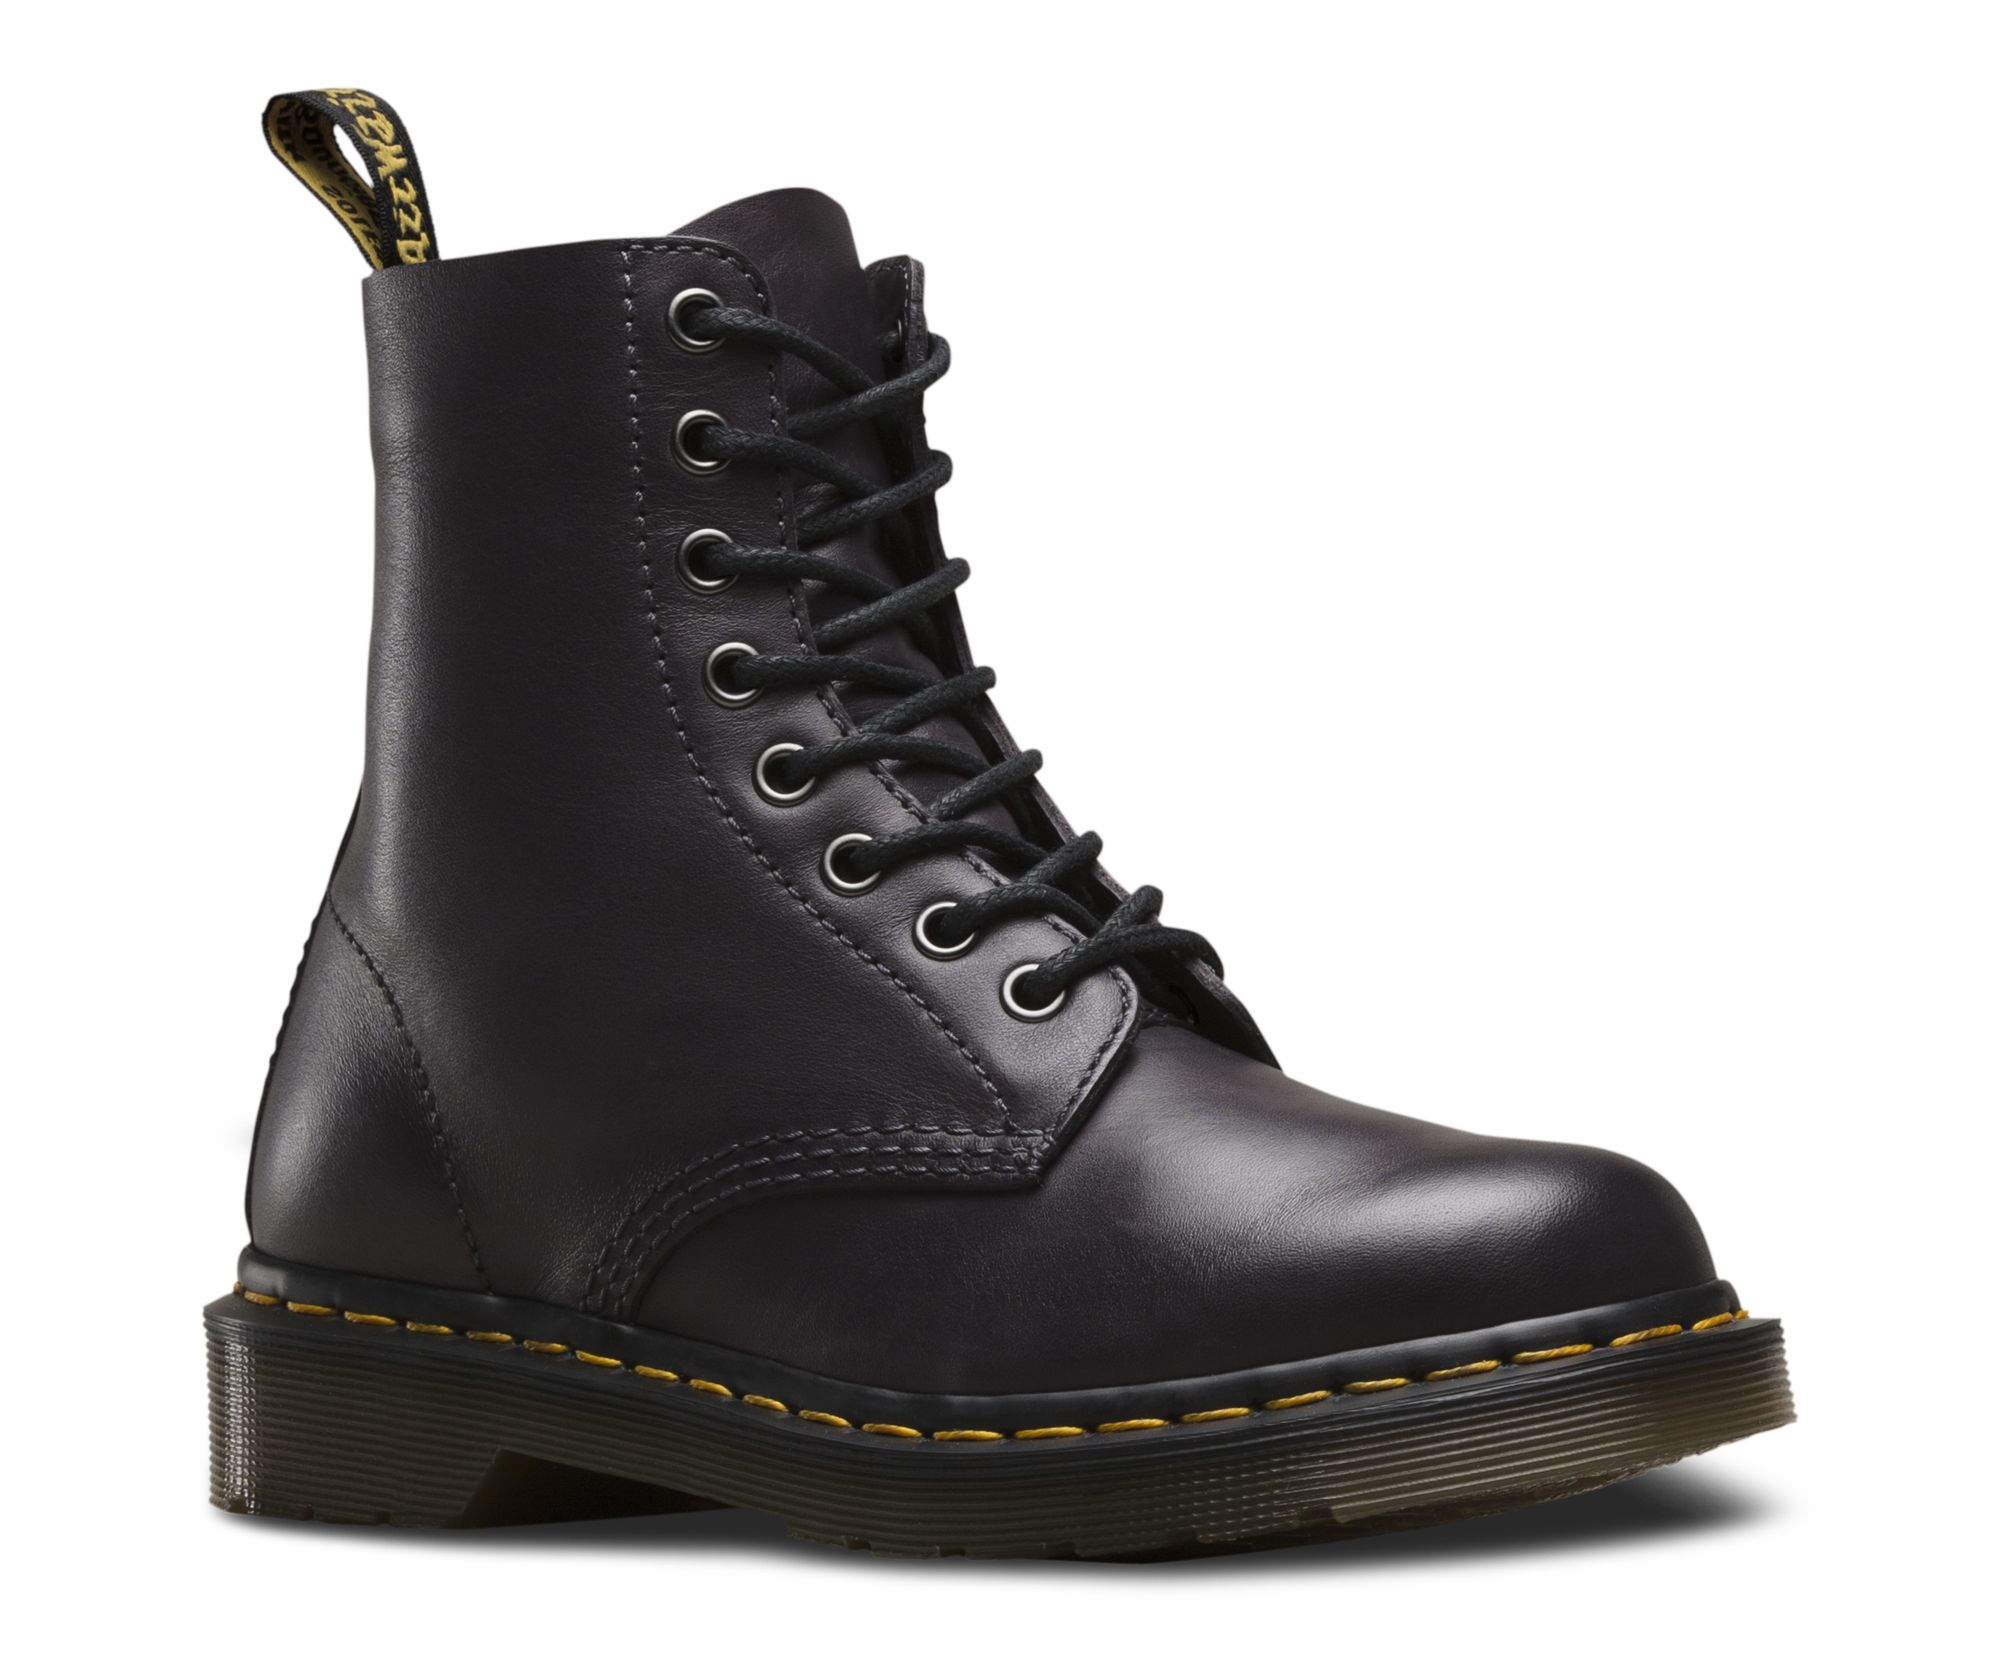 cb04c6d326 Size 9 PASCAL ANTIQUE TEMPERLEY BOOT   New Arrivals   Official Dr Martens  Store - US